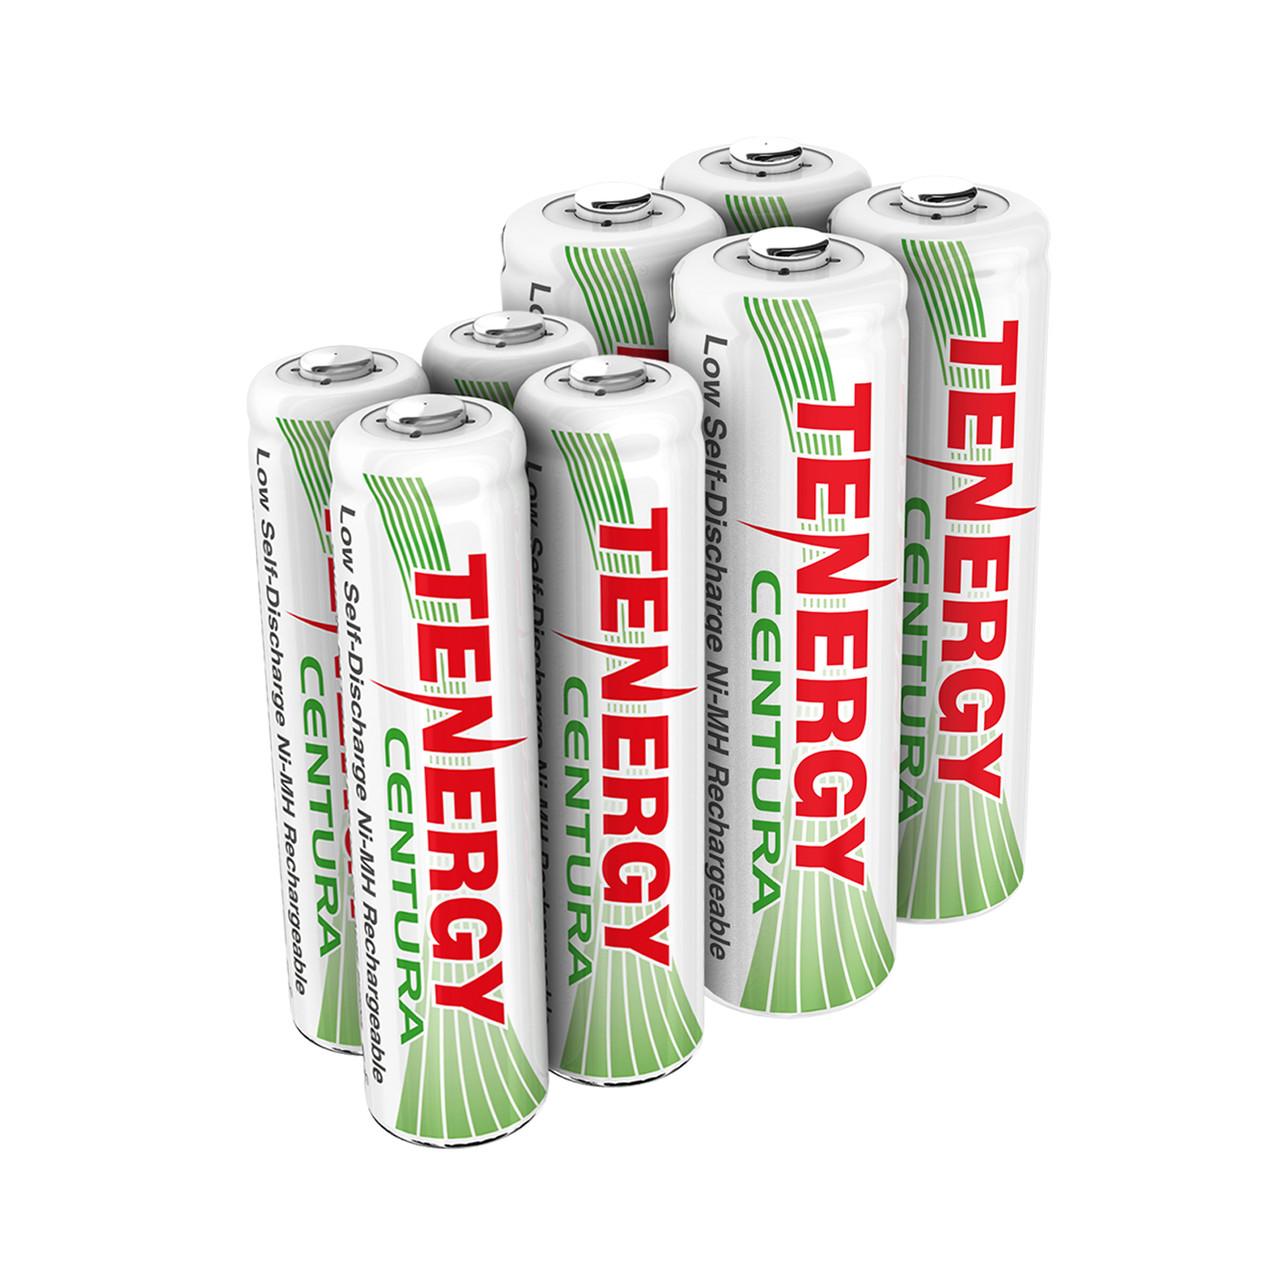 Combo: 8pcs Tenergy Centura NiMH 1.2V Rechargeable Batteries, (4AA/4AAA)